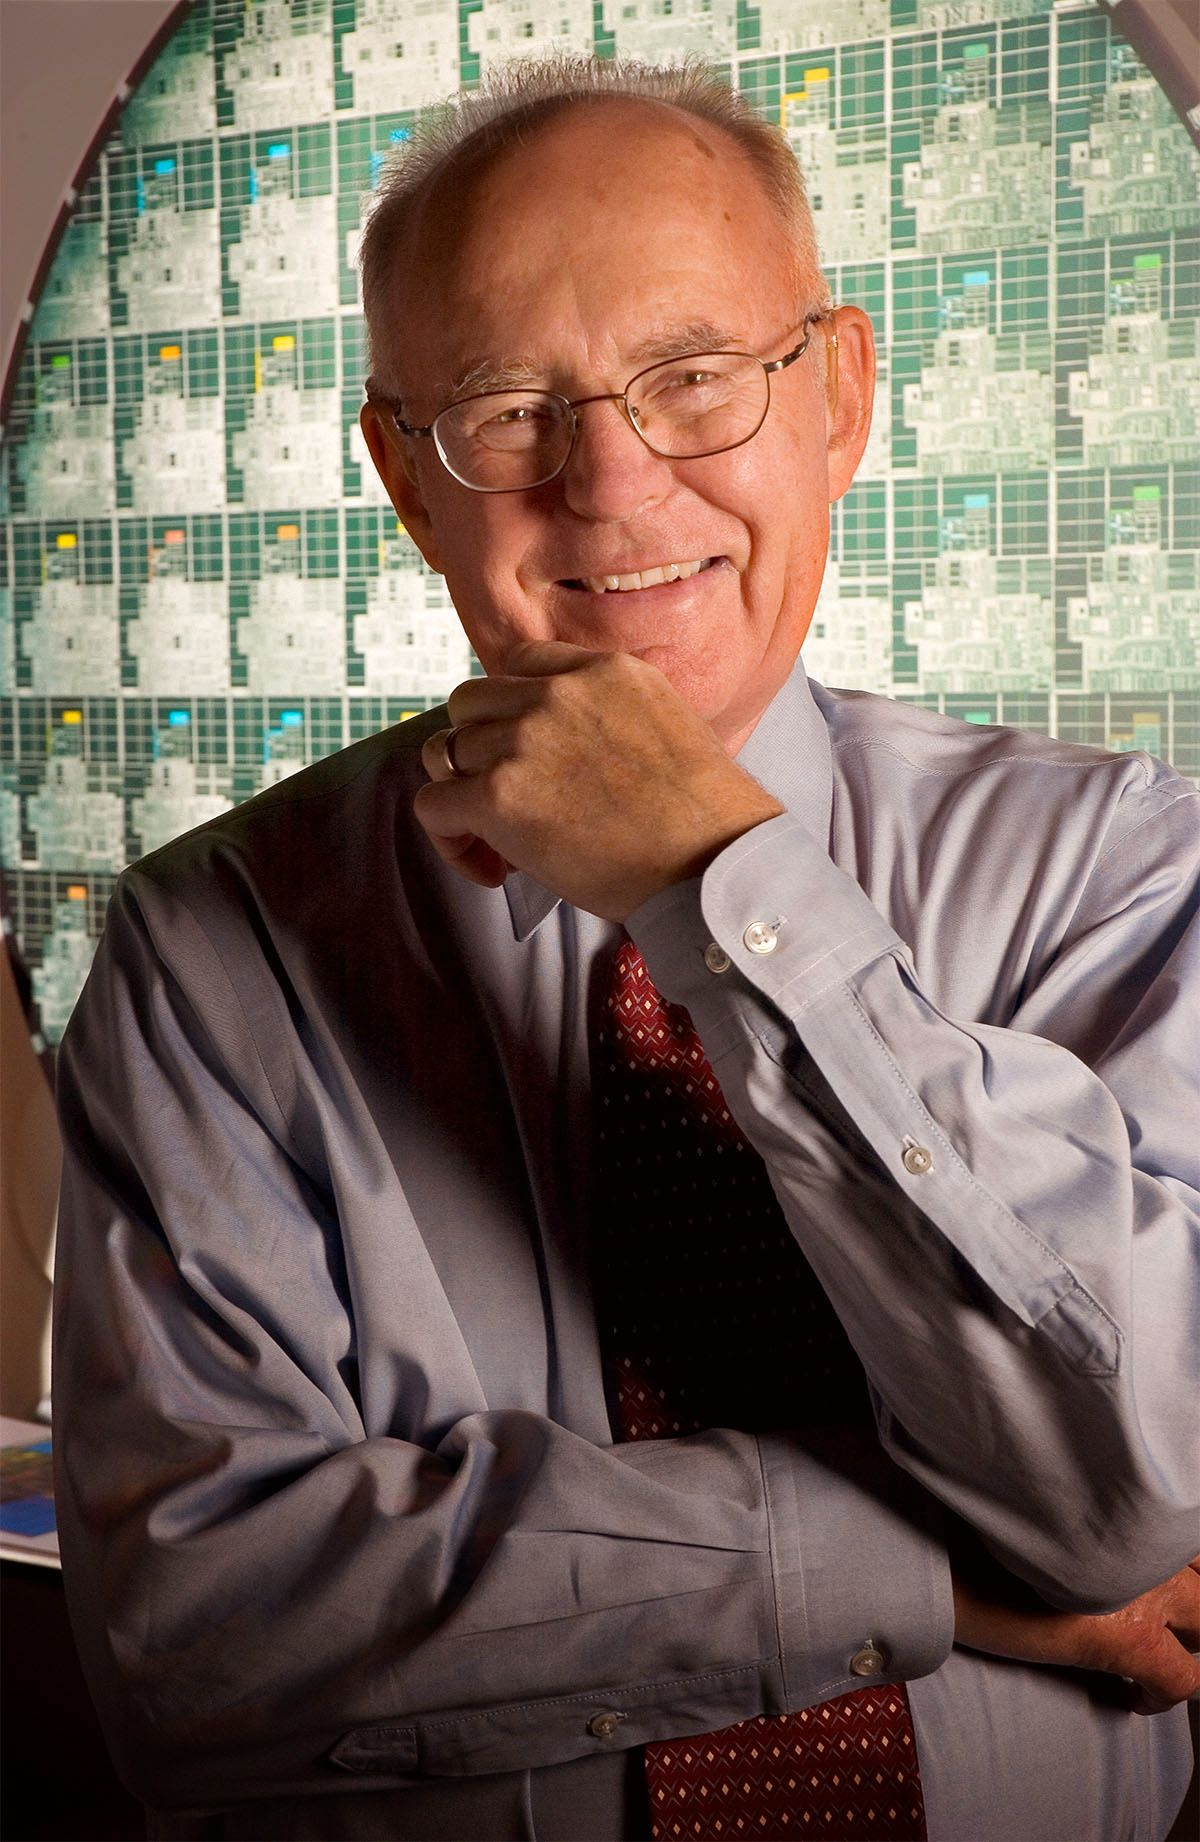 Gordon Moore, med-gründer og tidligere styreformann i Intel.